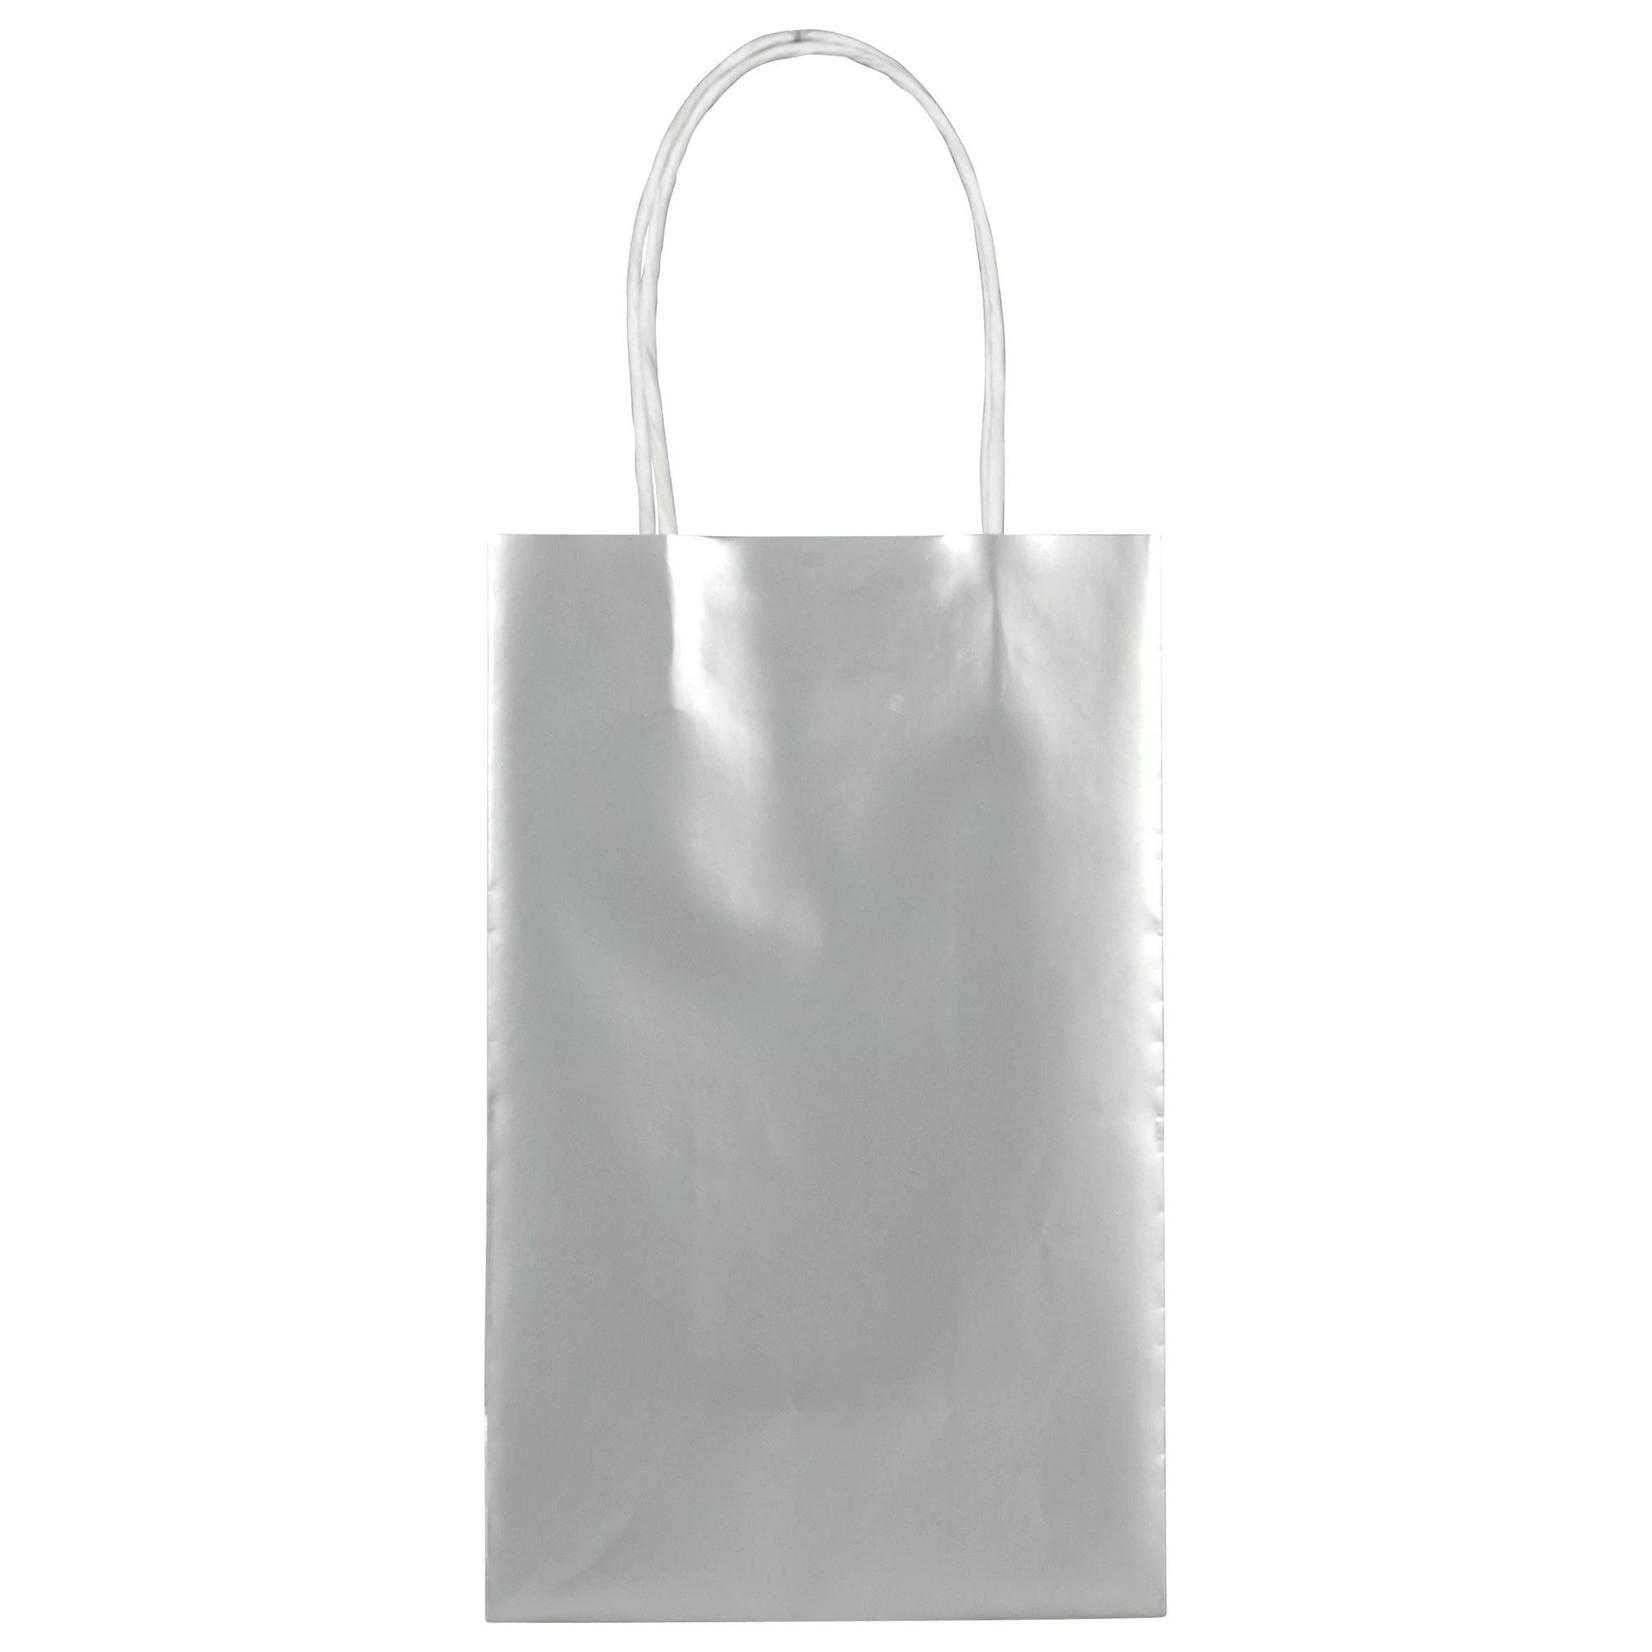 Bags - Silver - 10pk - 5.12X8.25X3.12 in